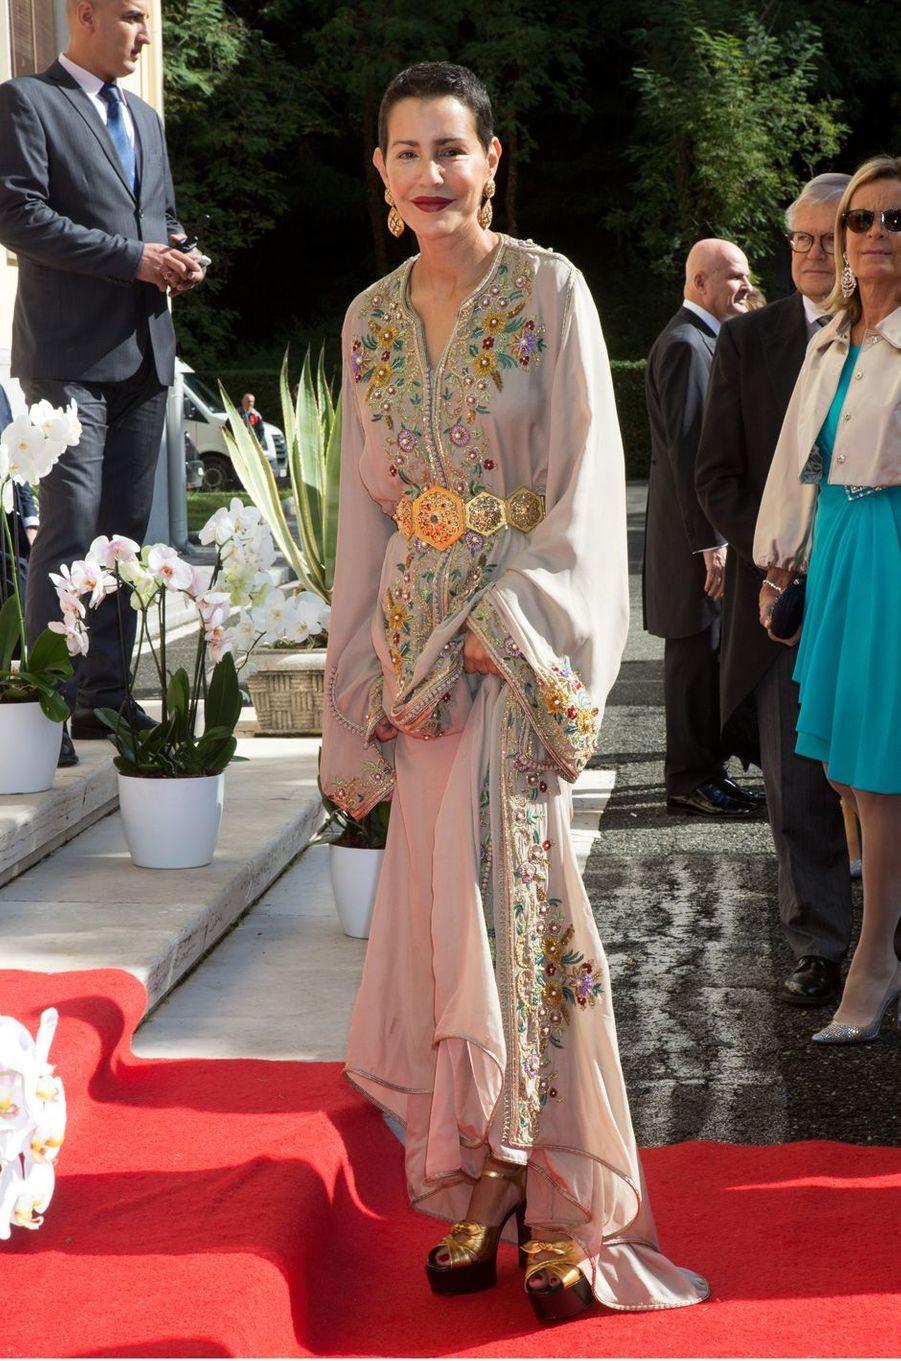 La princesse Lalla Meryem du Maroc